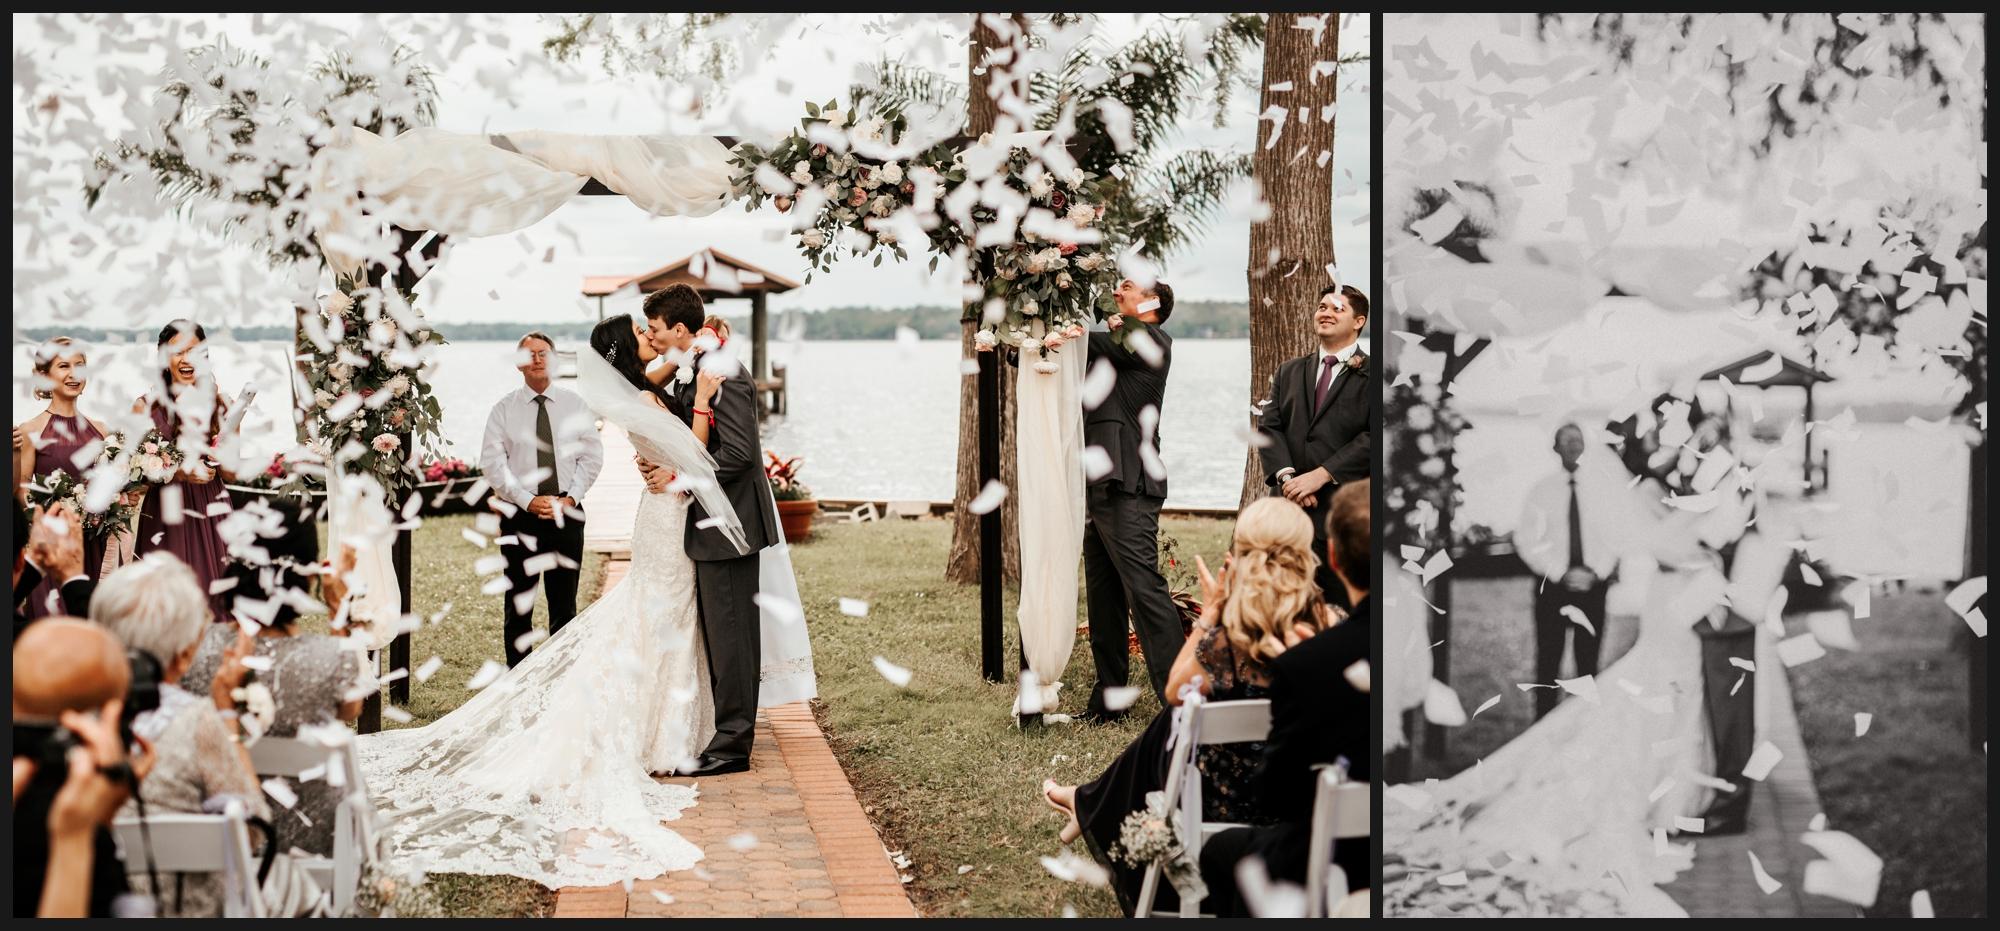 Orlando-Wedding-Photographer-destination-wedding-photographer-florida-wedding-photographer-bohemian-wedding-photographer_1359.jpg